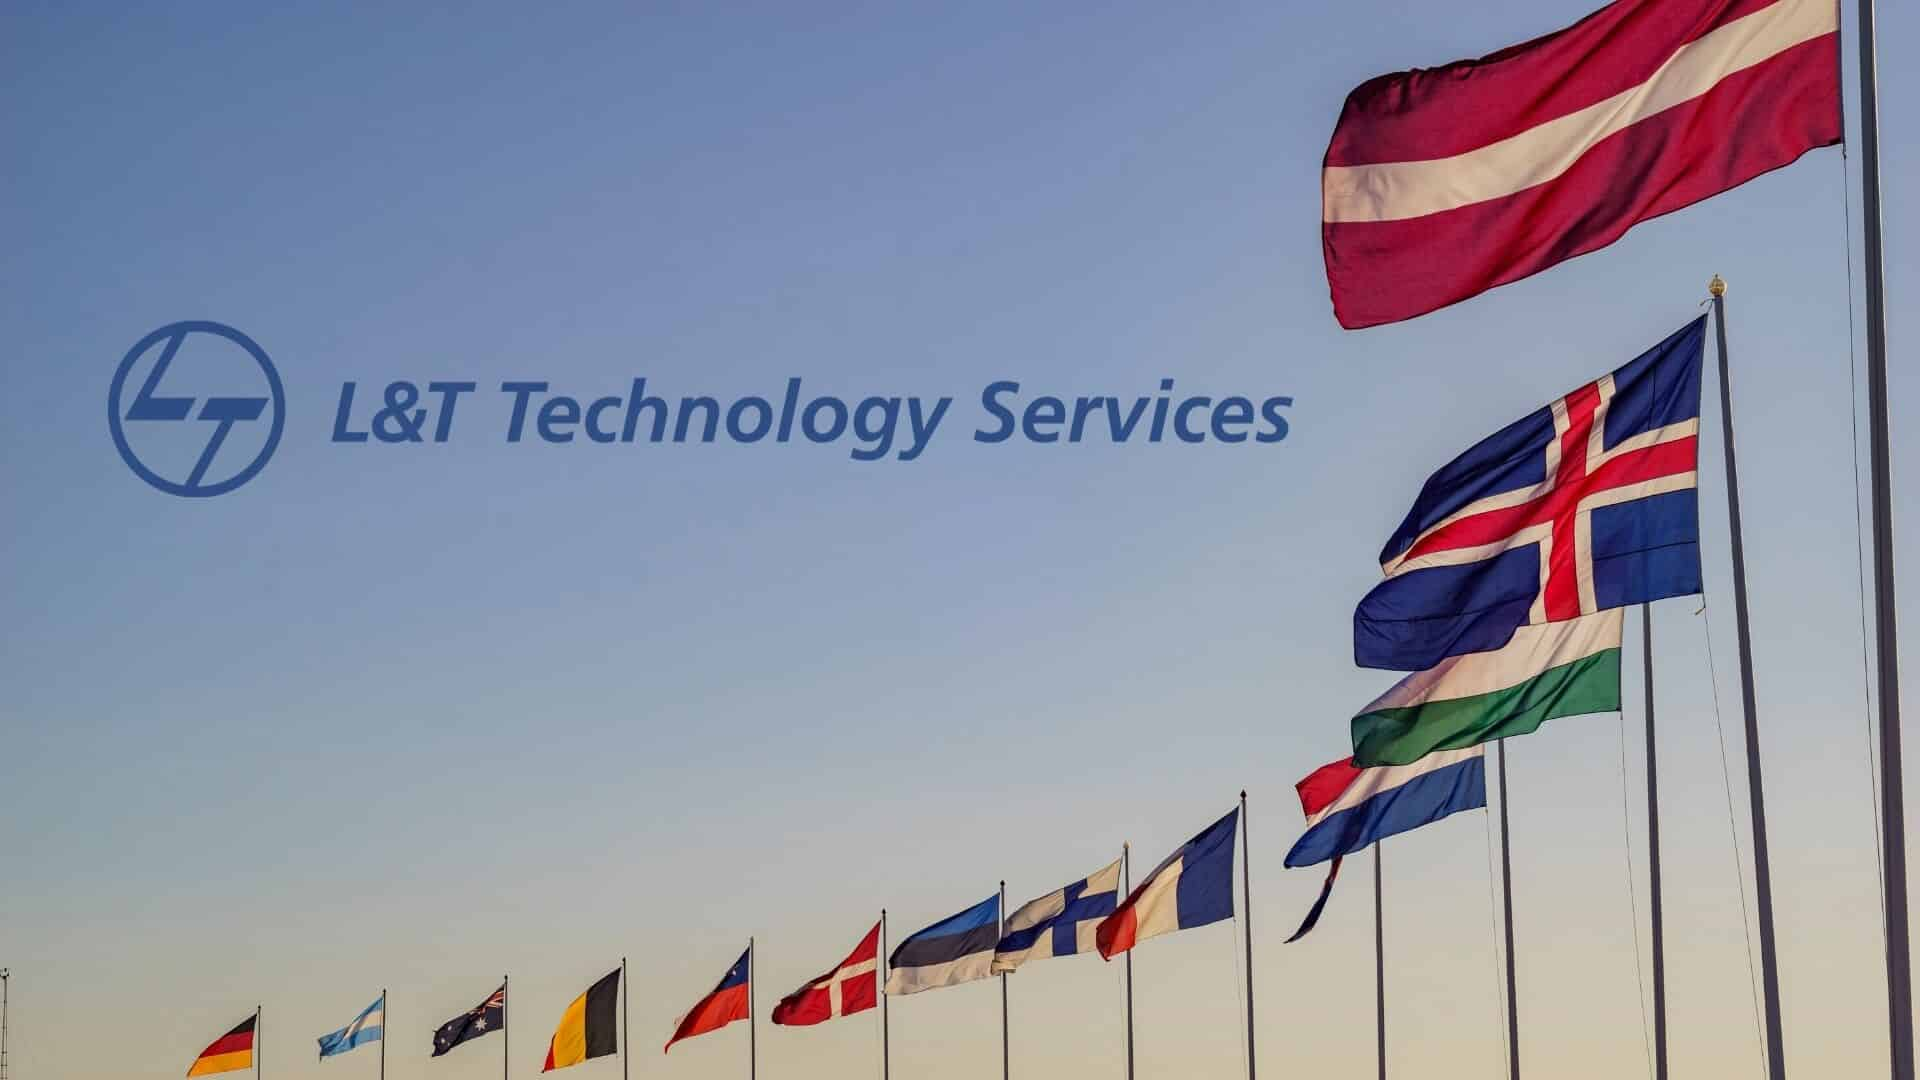 L&T Technology Services Announces Lucrative Project Acquisition in Europe